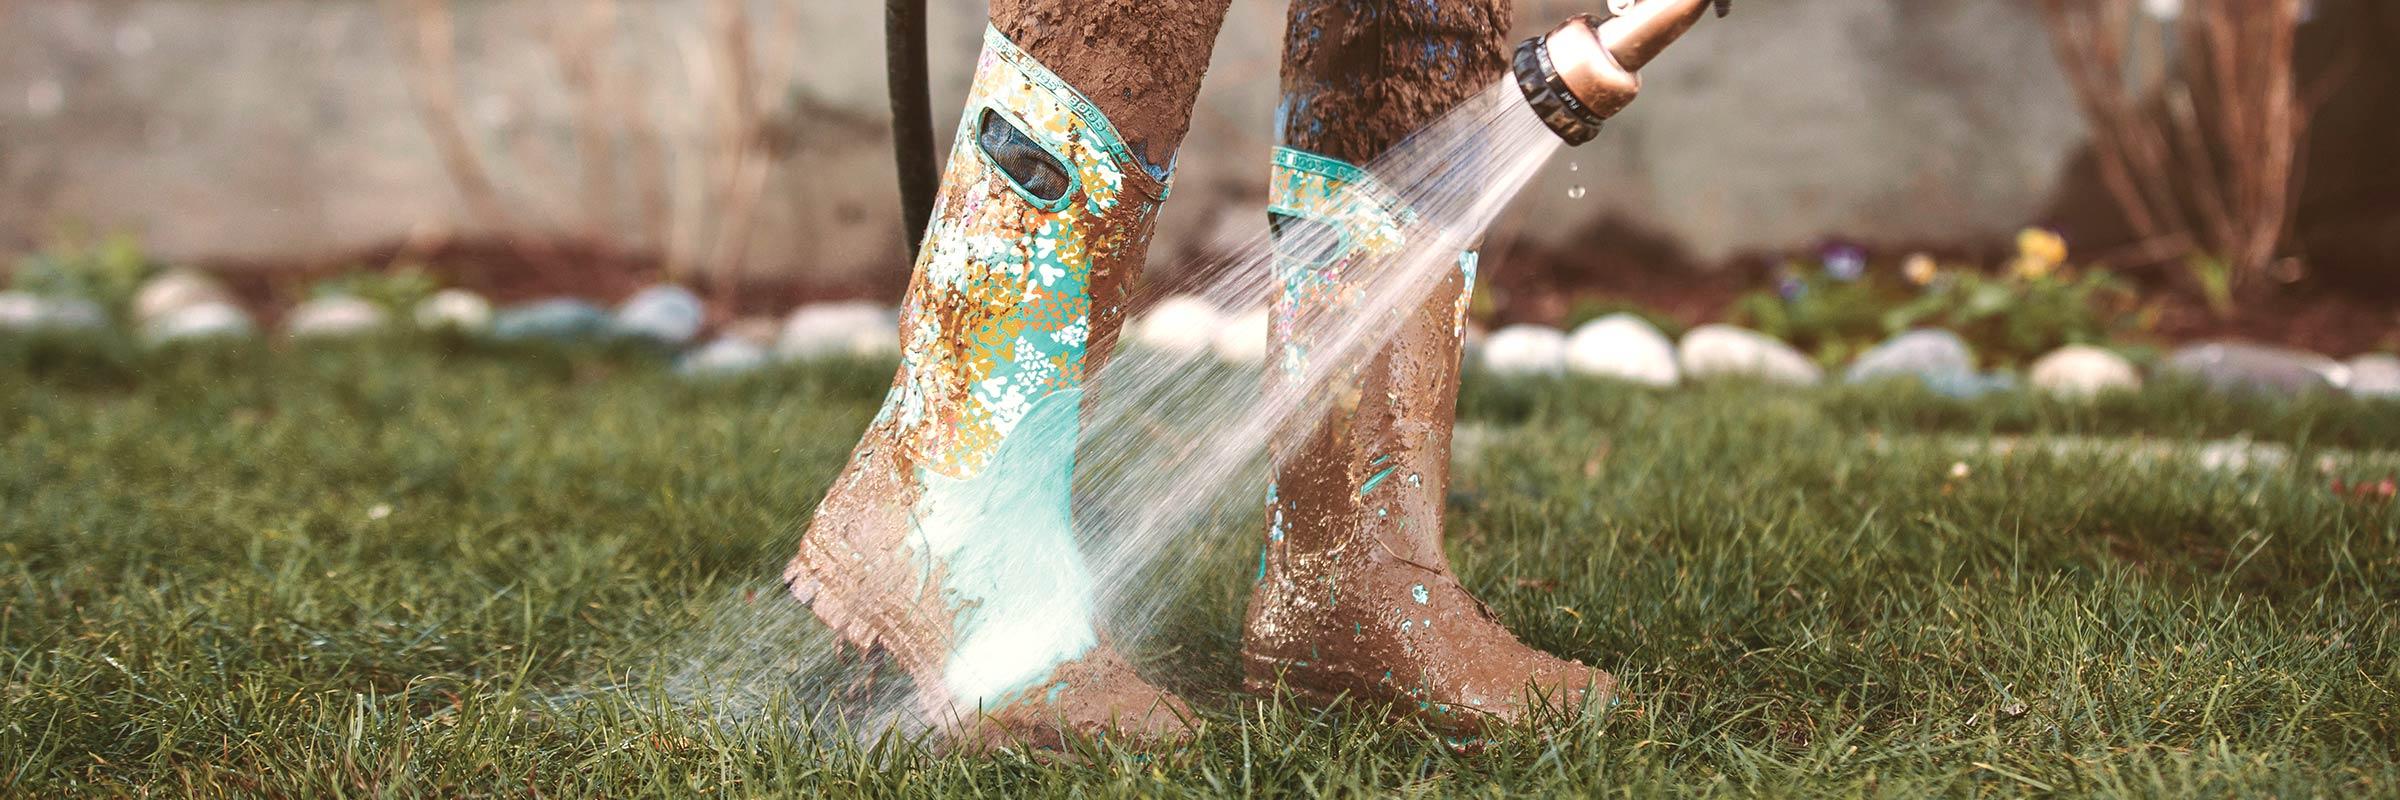 ltitude-sports-Best-Rain-Boots-Spring-2018-Bogs-4